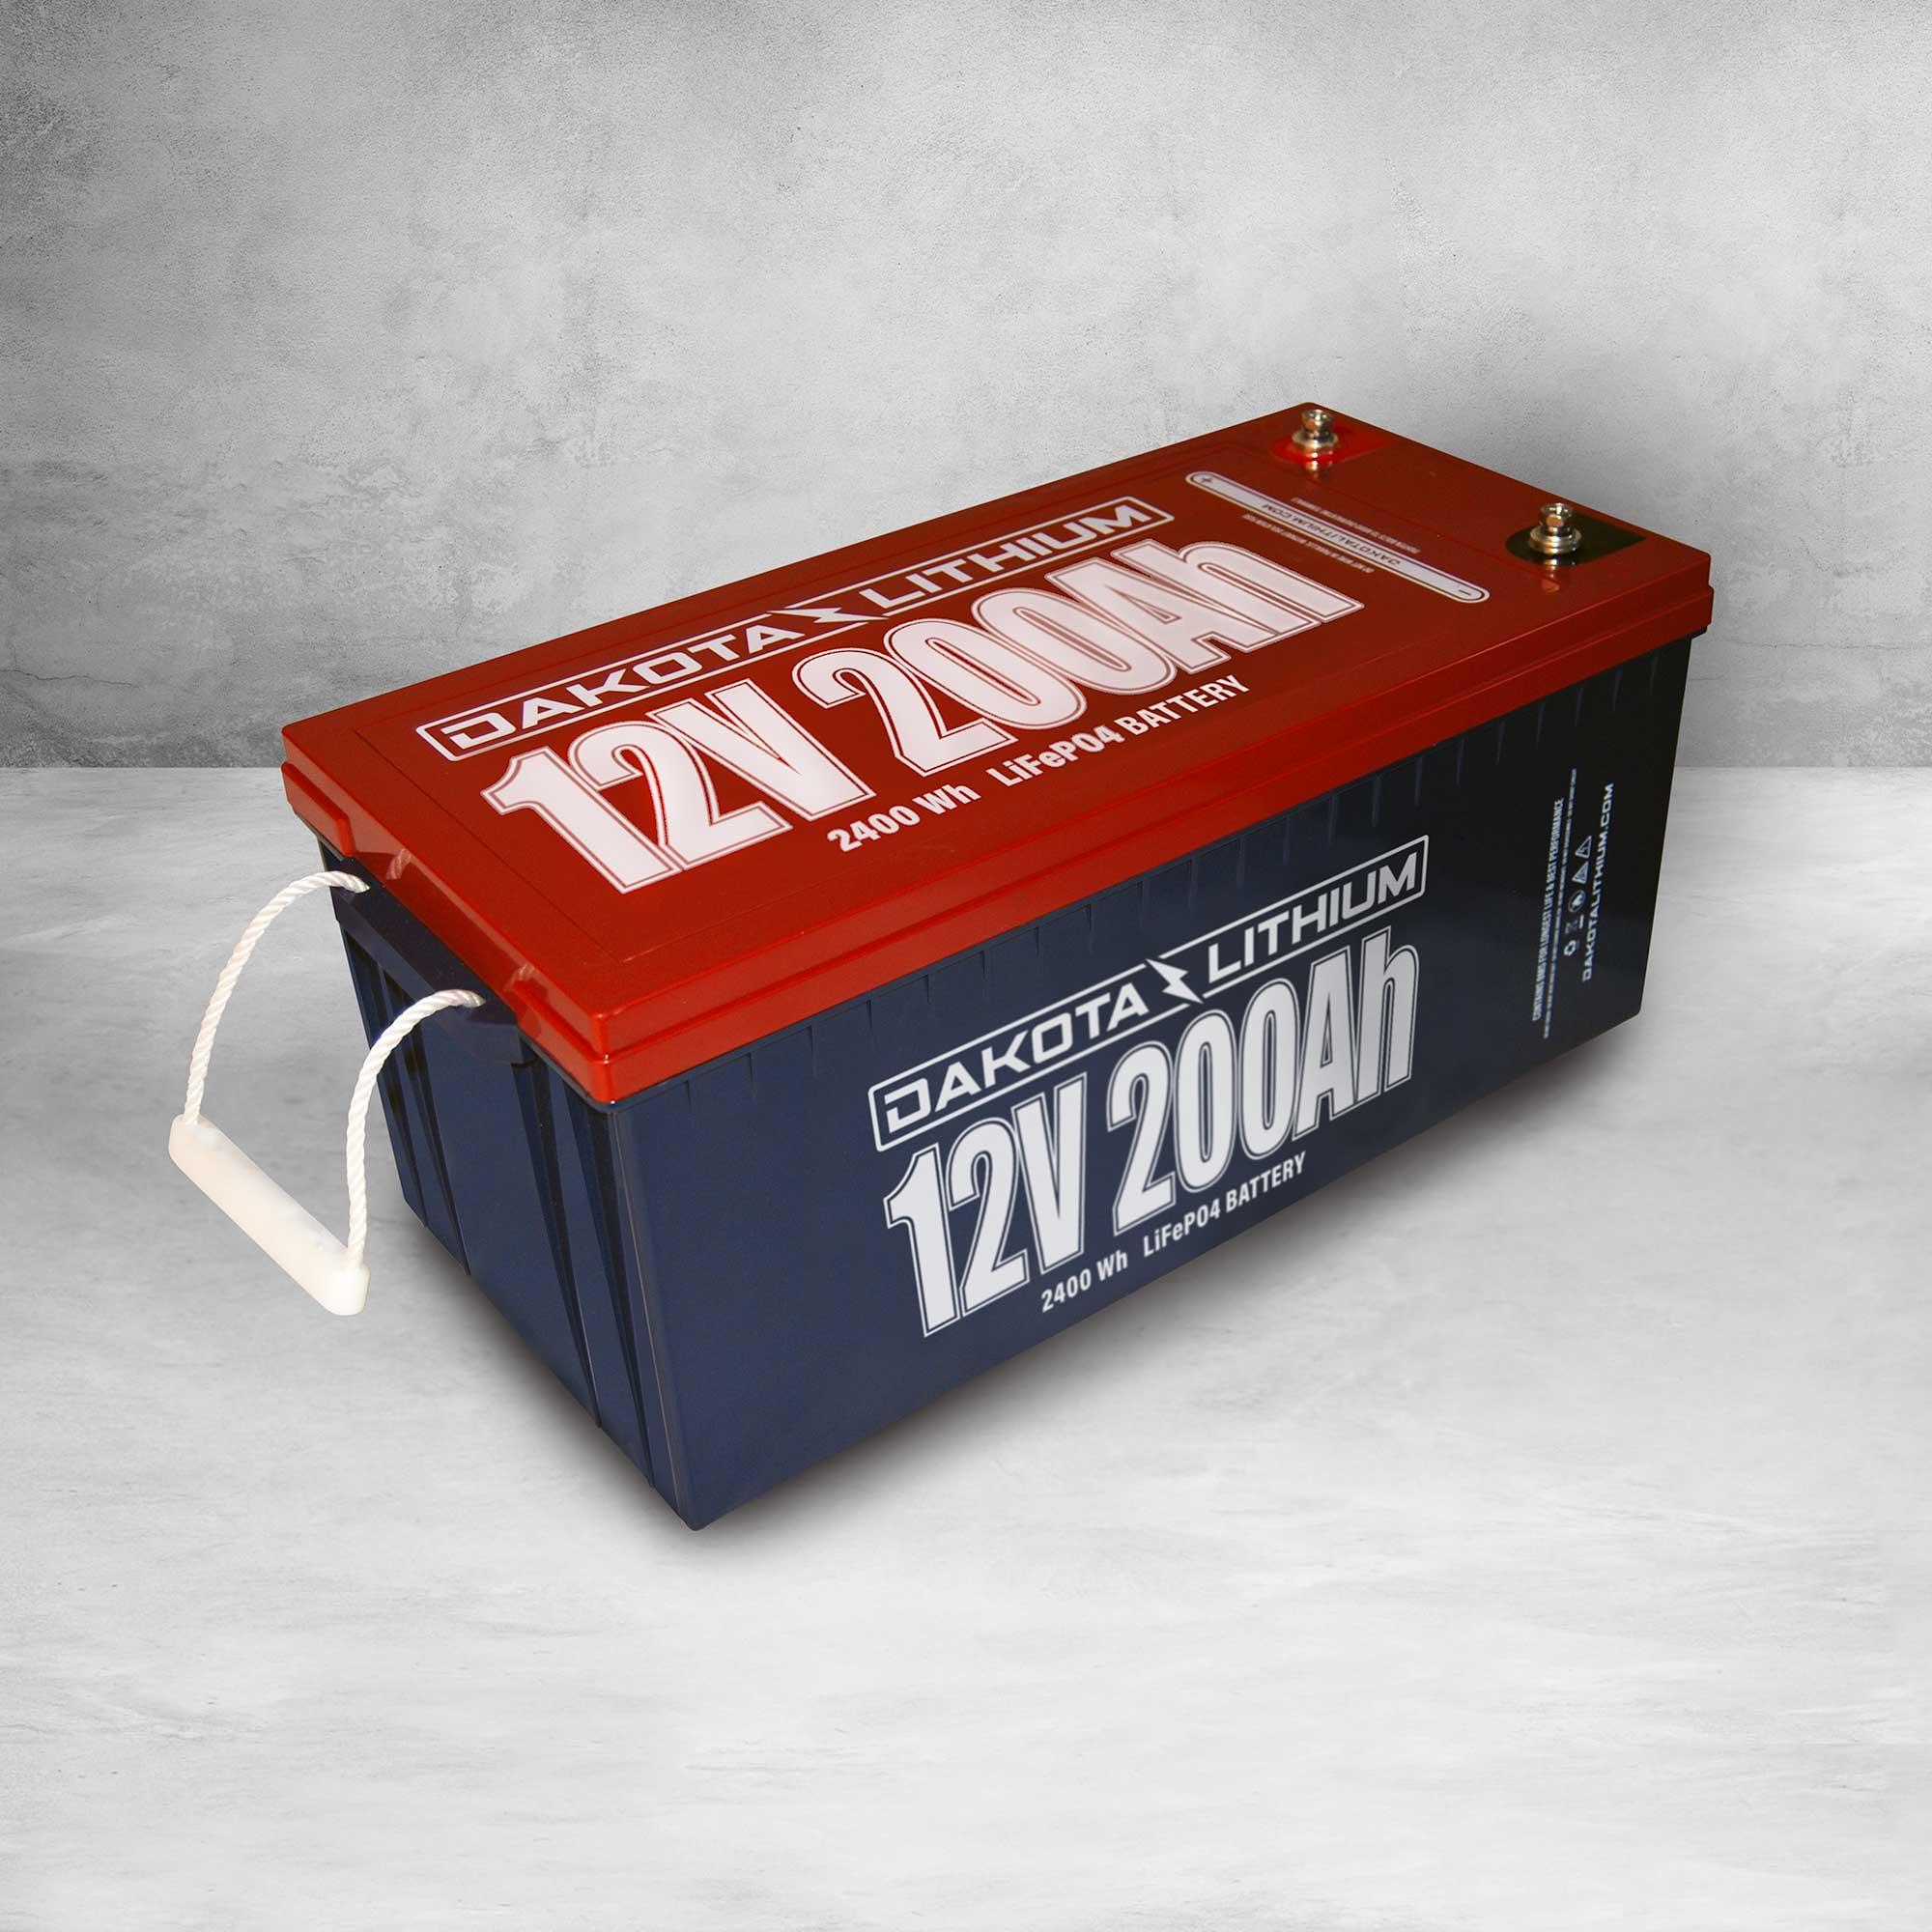 Dakota Lithium 200 Ah 12V LiFePO4 Deep Cycle Battery